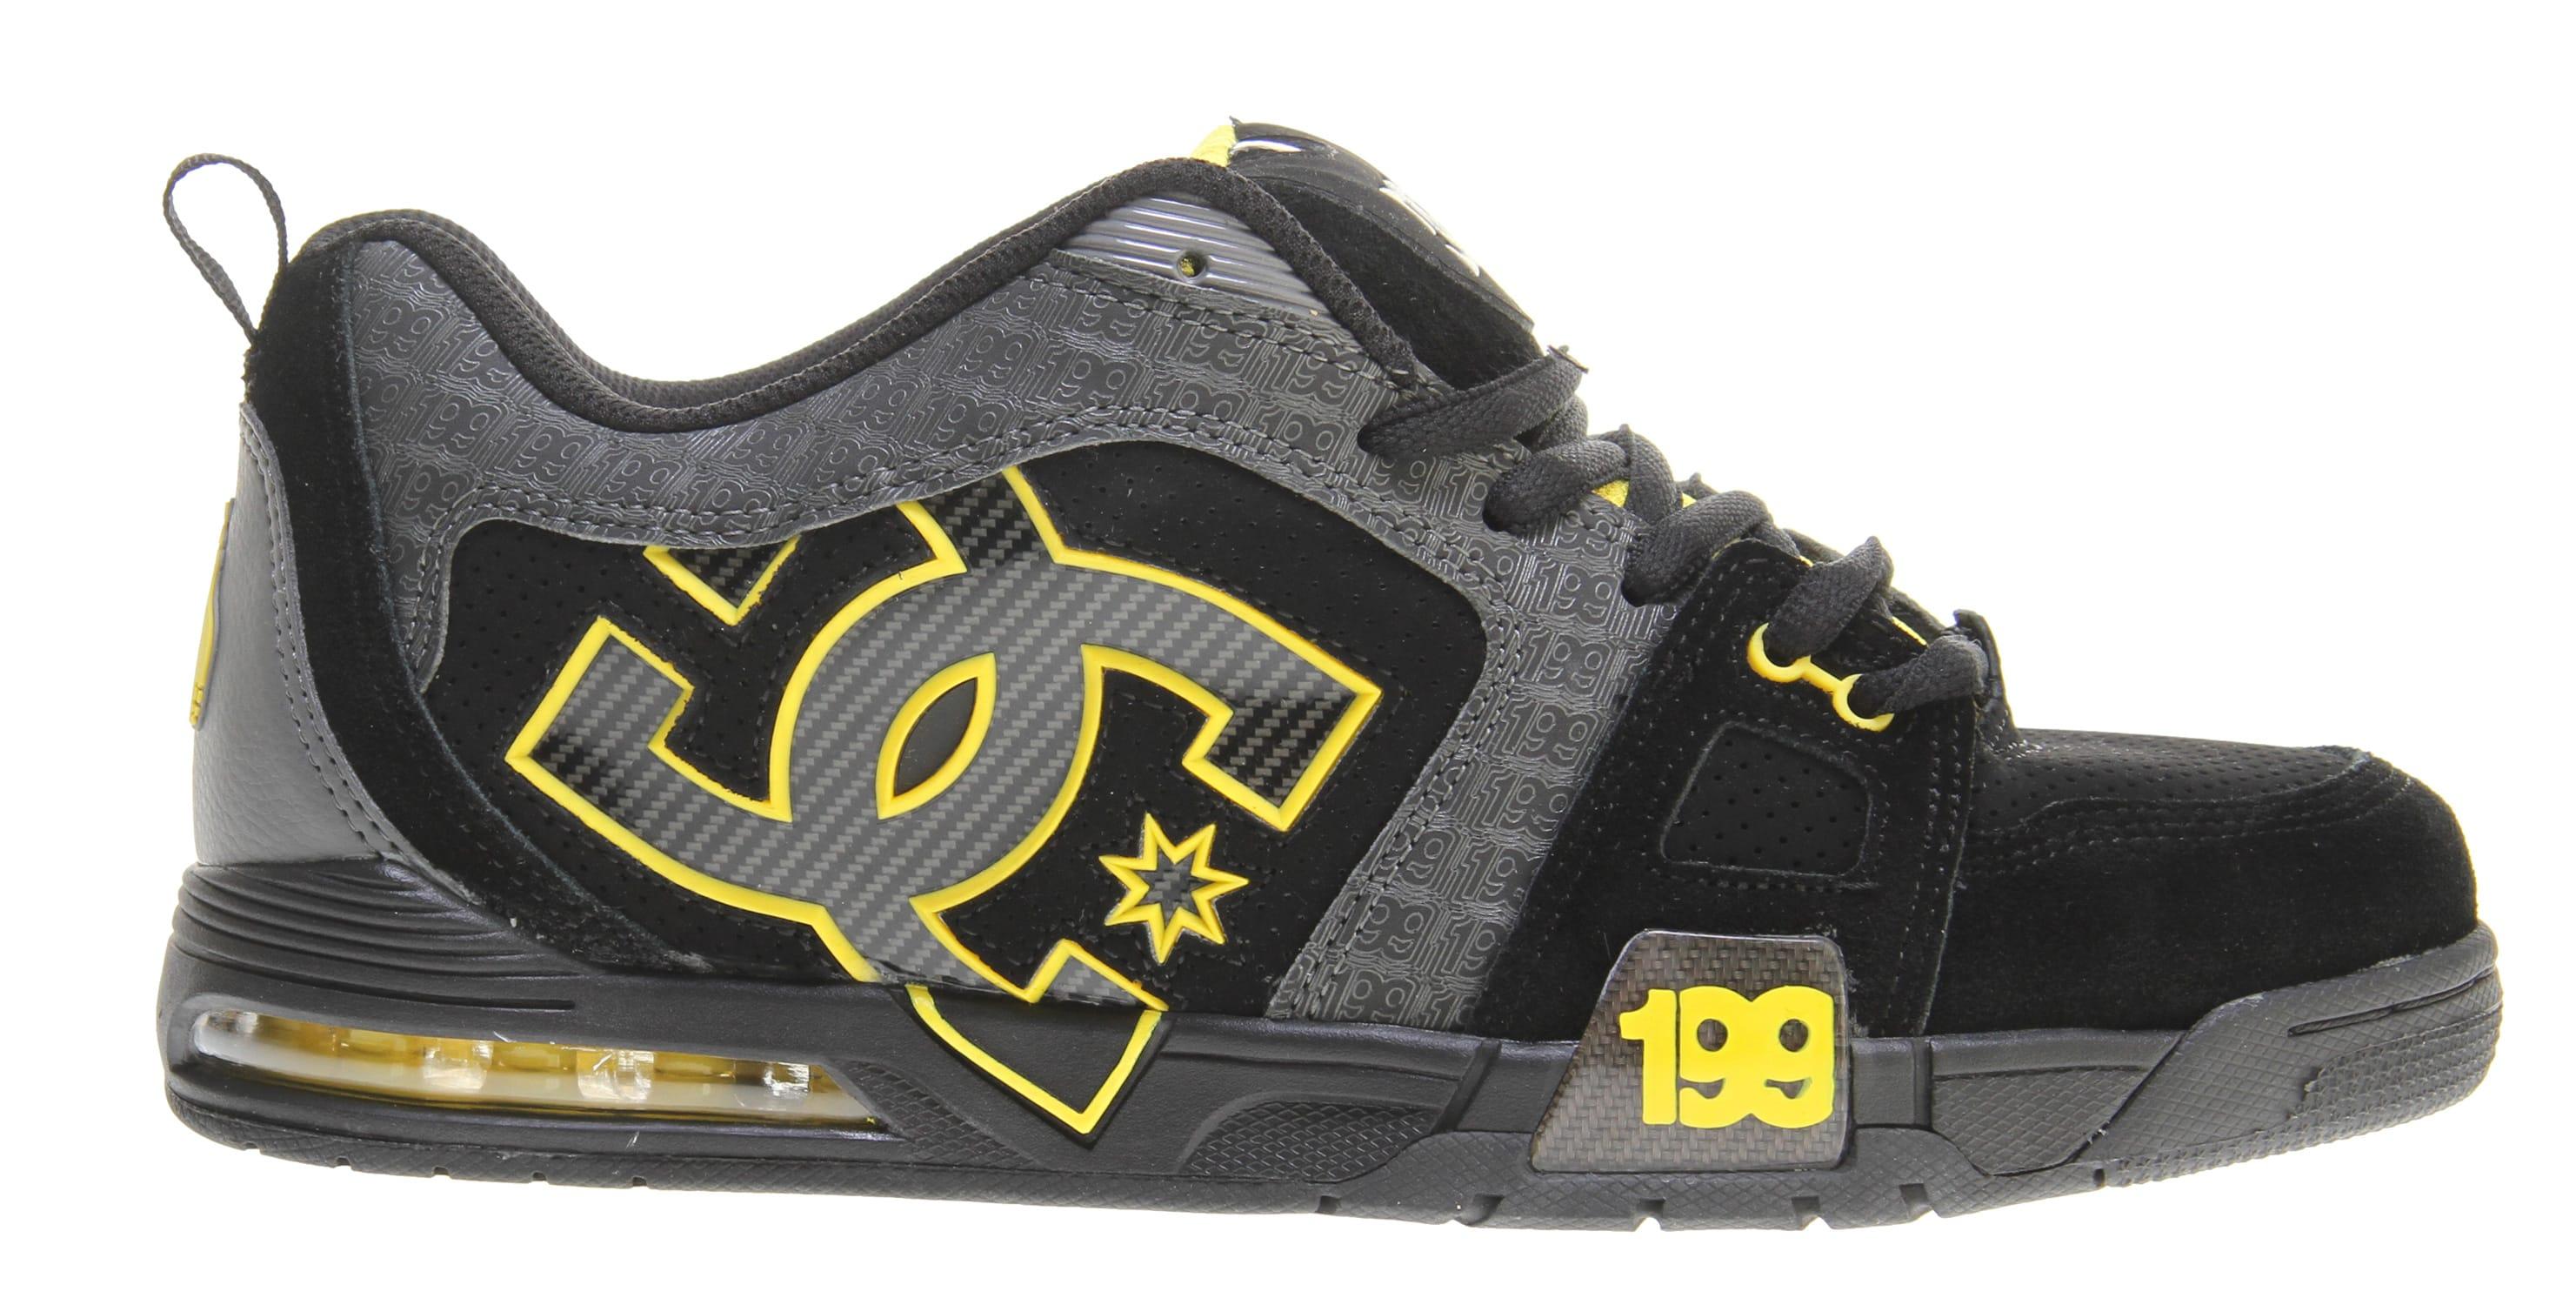 reputable site e4d6c 7d21b DC Frenzy Tp Skate Shoes - thumbnail 1